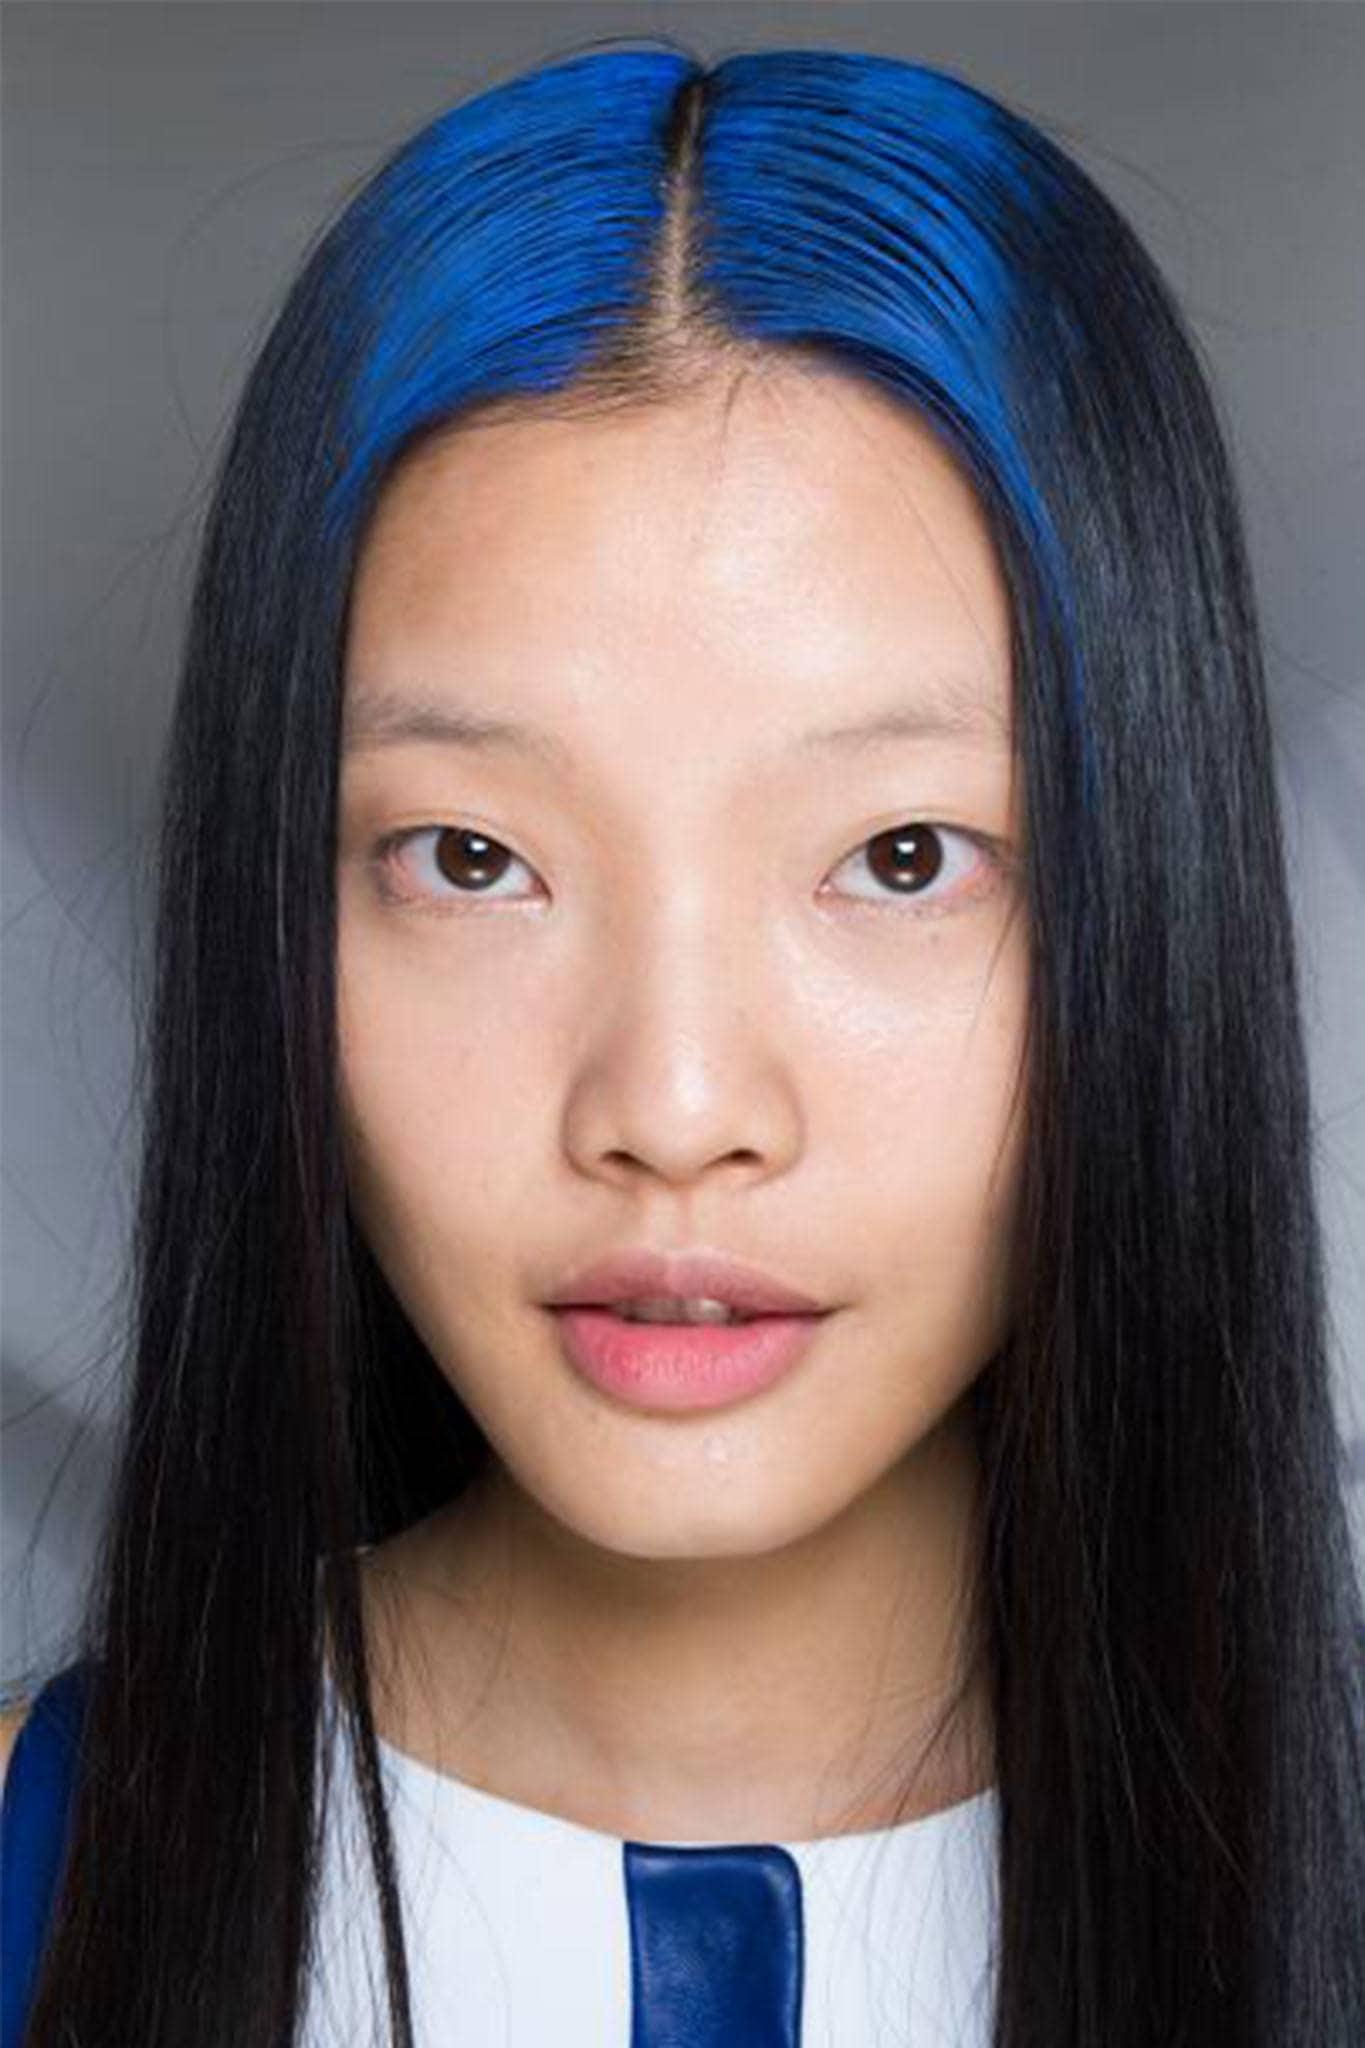 mujer con raíces azules